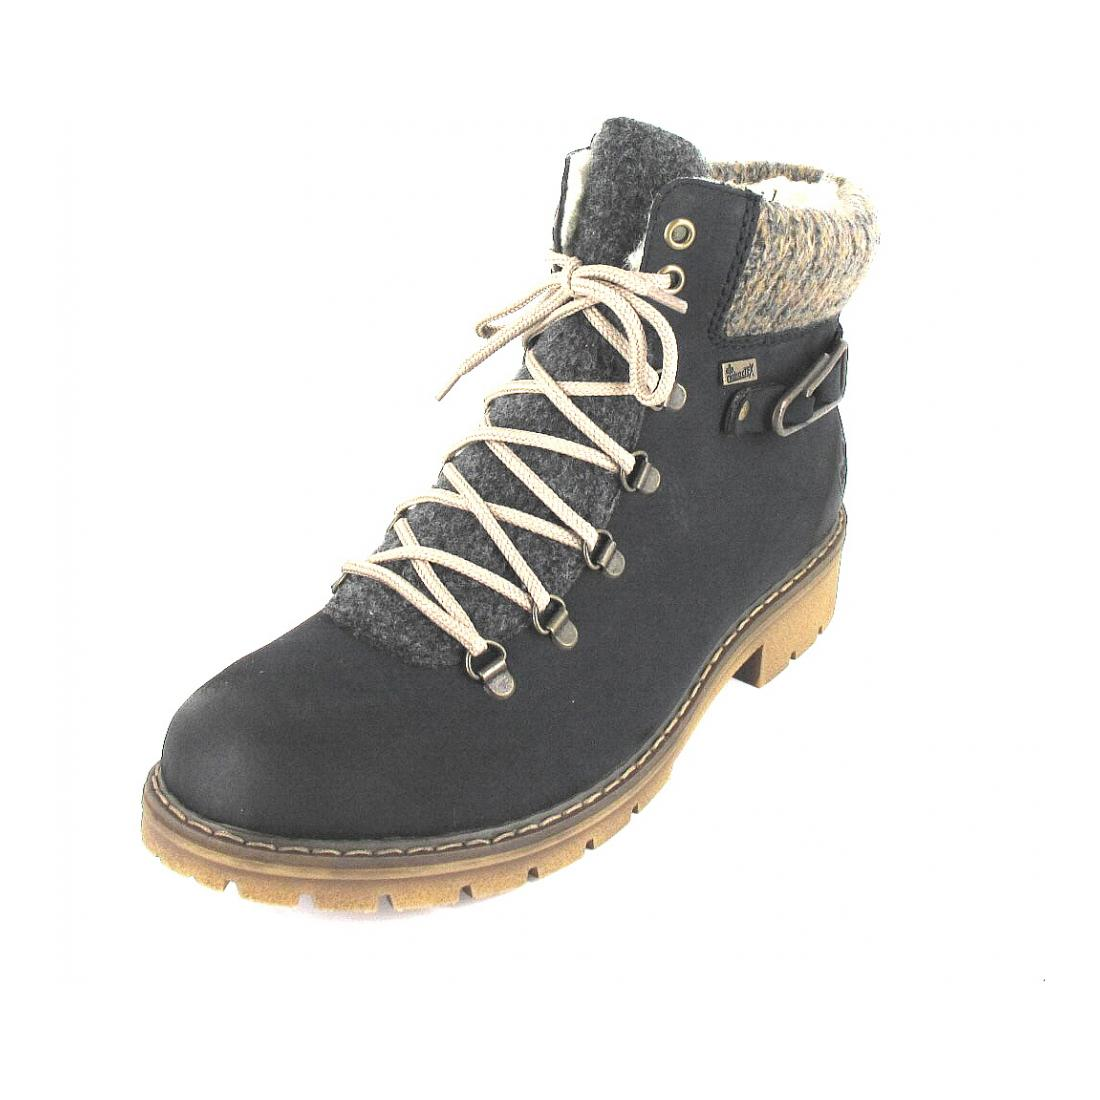 Rieker Boots pazifik/anthrazit/graphit